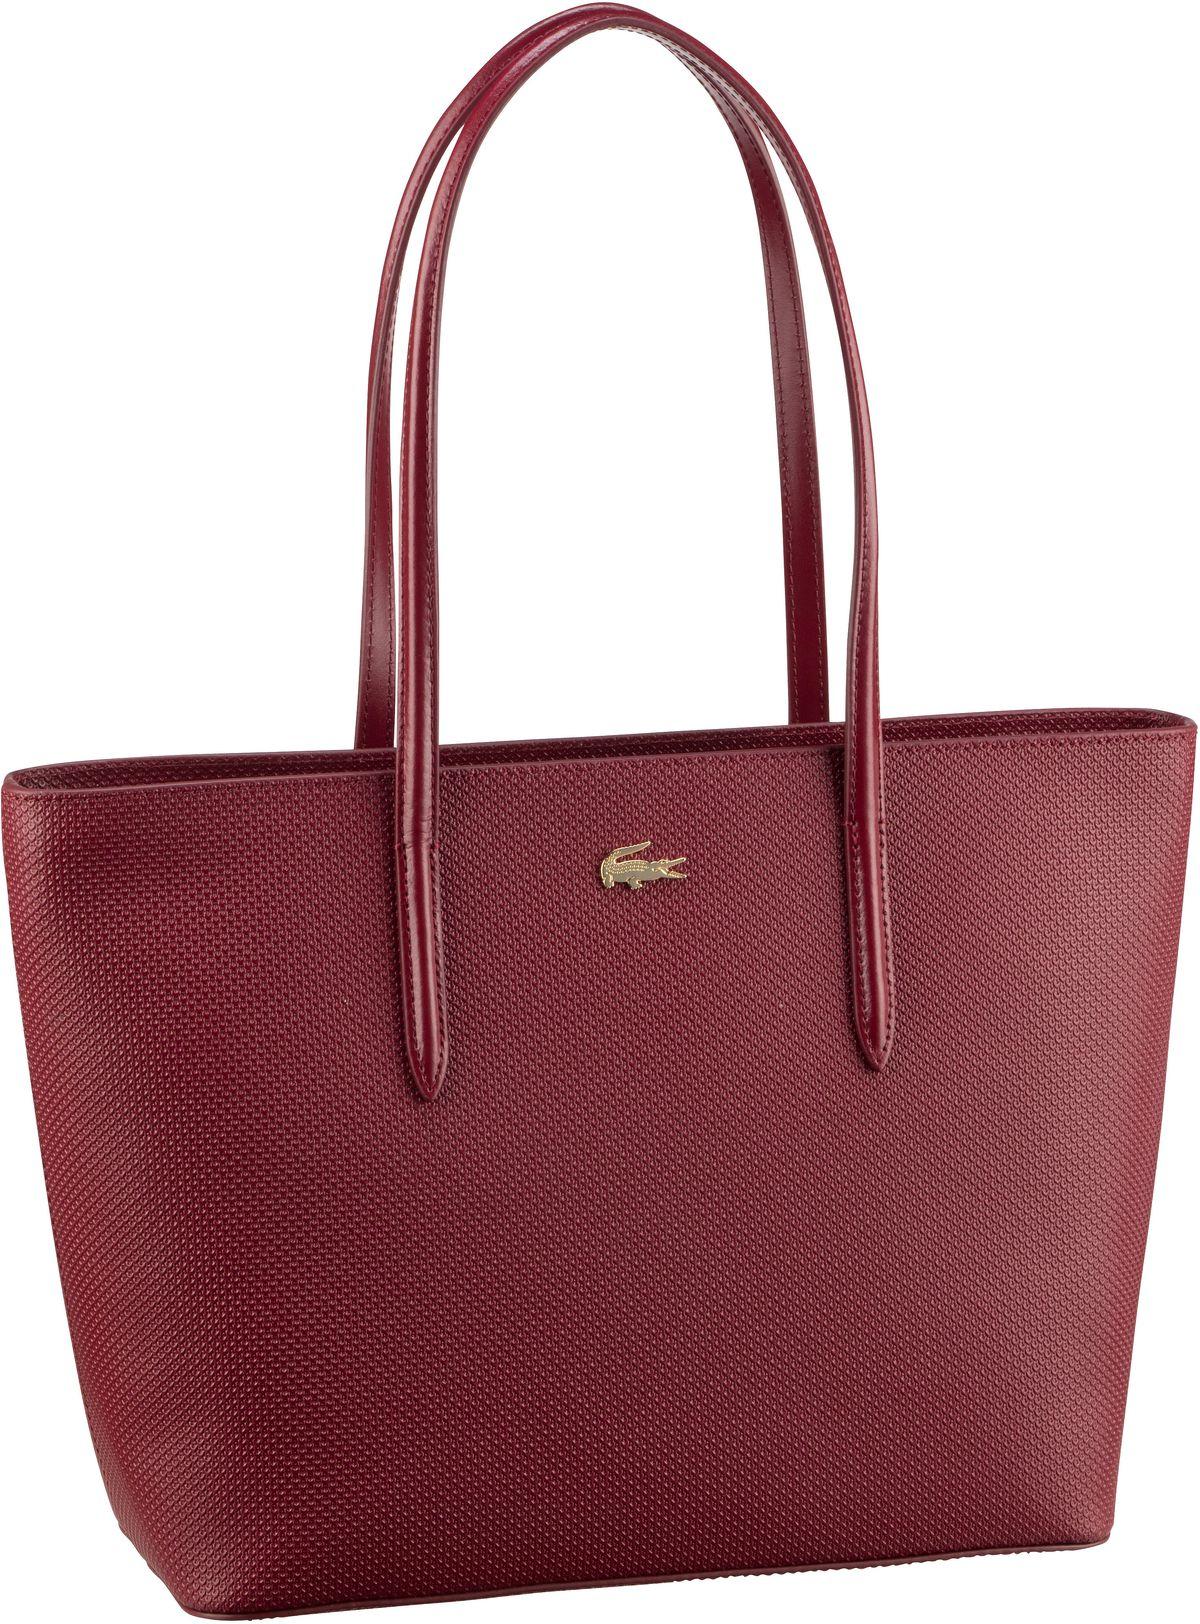 Handtasche Chantaco Shopping Bag 2733 Tawny Port